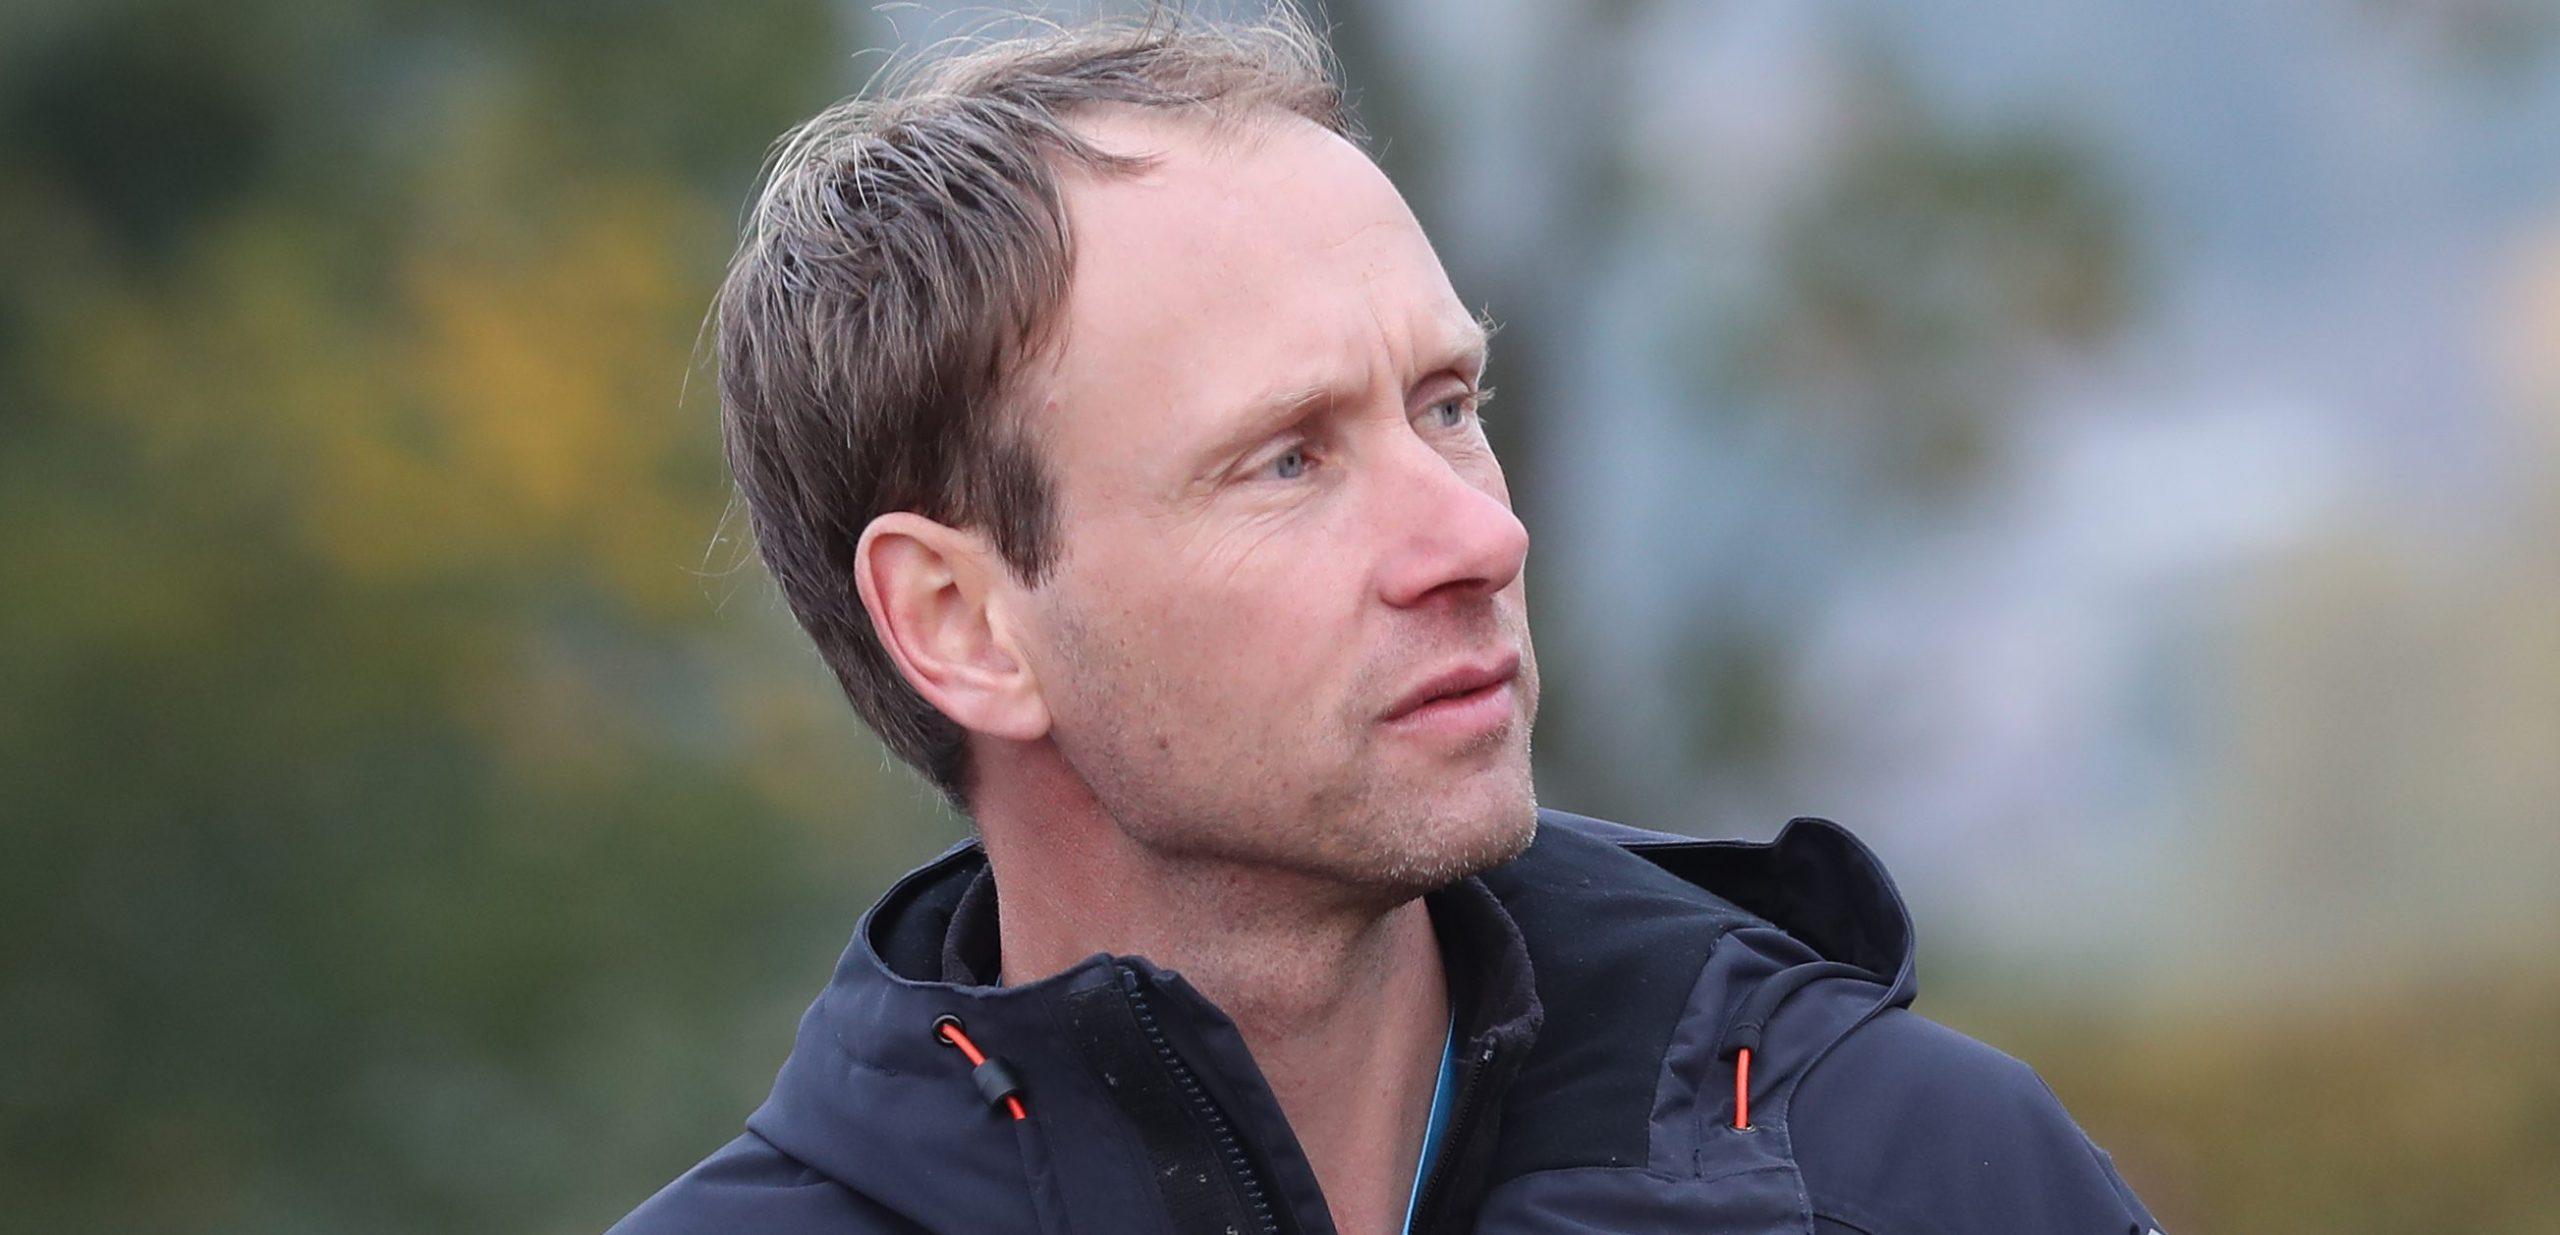 Mountain Bike World Championships: Gerben de Knigt hopes for Dutch medal: 'Especially among women'